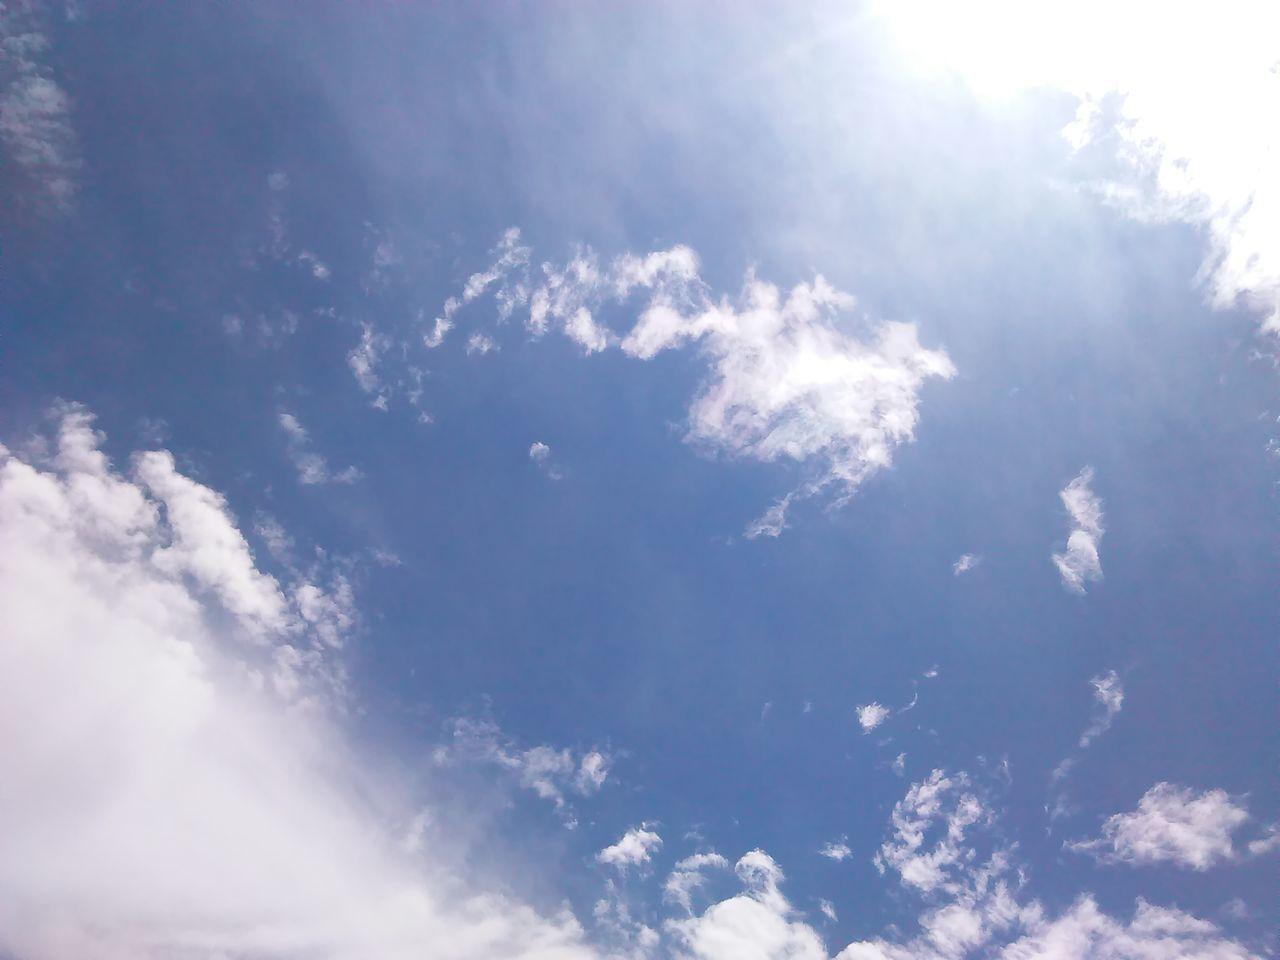 Cloud - Sky Sky Nature Beauty In Nature Outdoors EyeEm Nature Lover EyeEm Best Shots EyeEmNewHere EyeEm Gallery EyeEmBestPics EyeEm Best Shots - Nature Enjoying The Sun EyeEm Ey